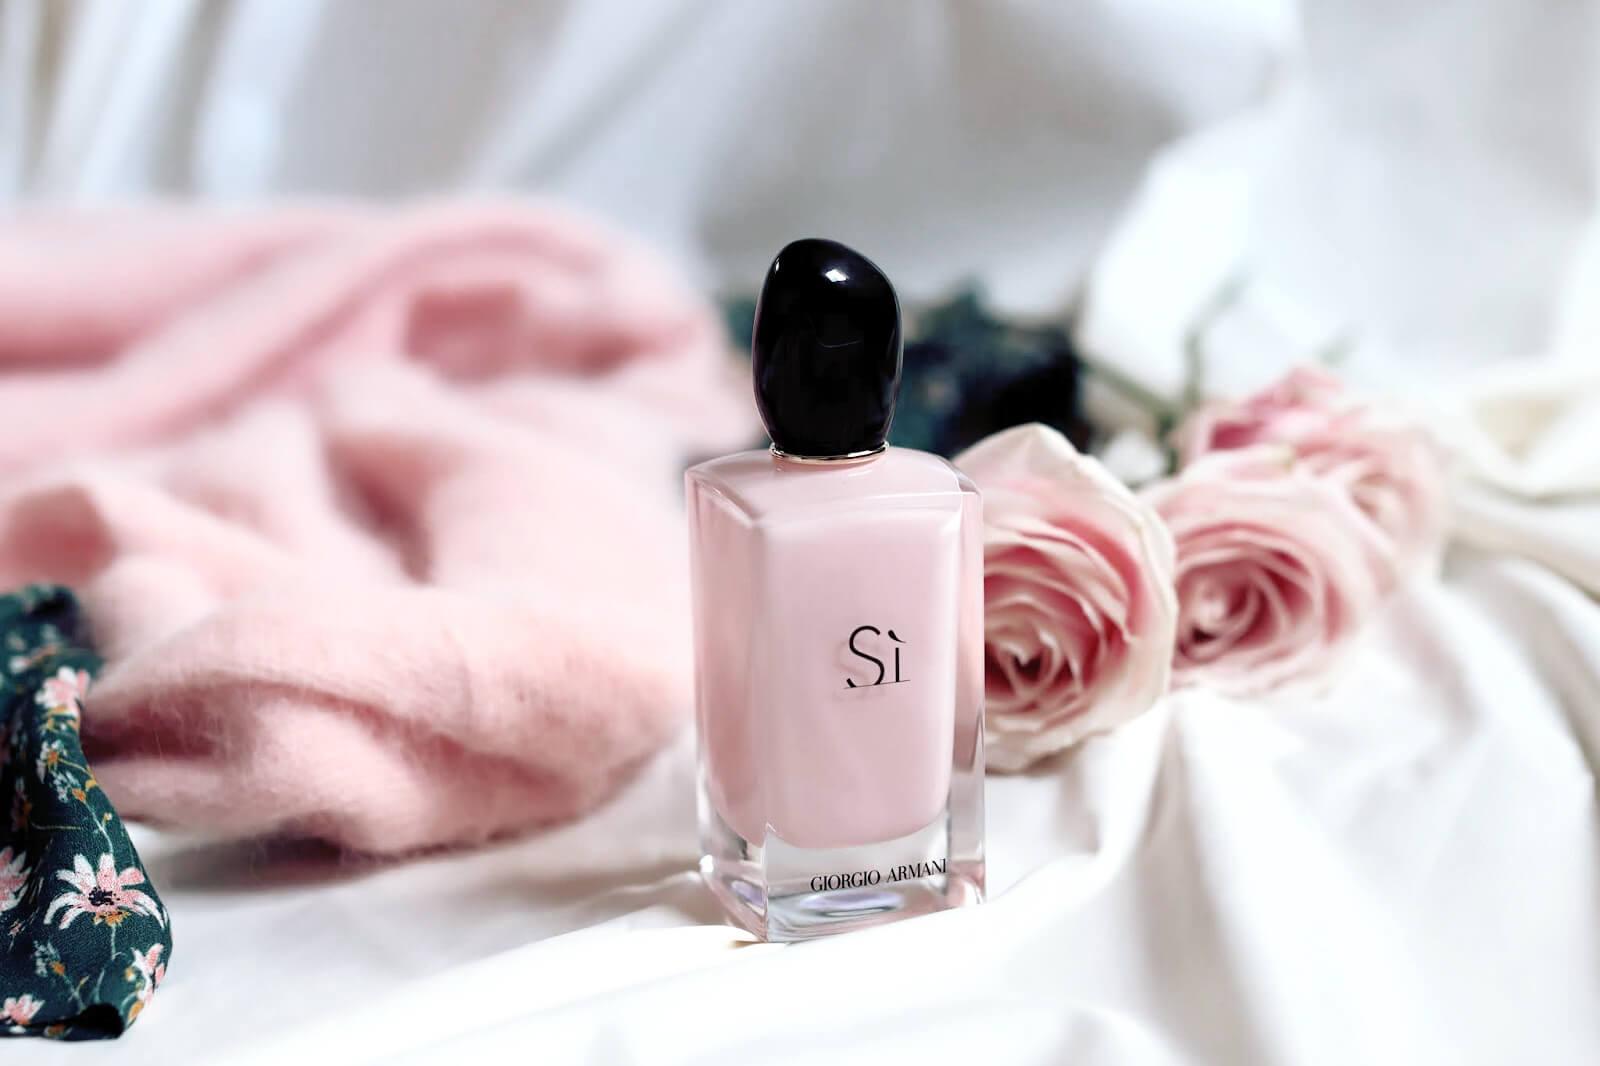 armani-si-fiori-nouveau-parfum-printemps-2019-avis-test-critique